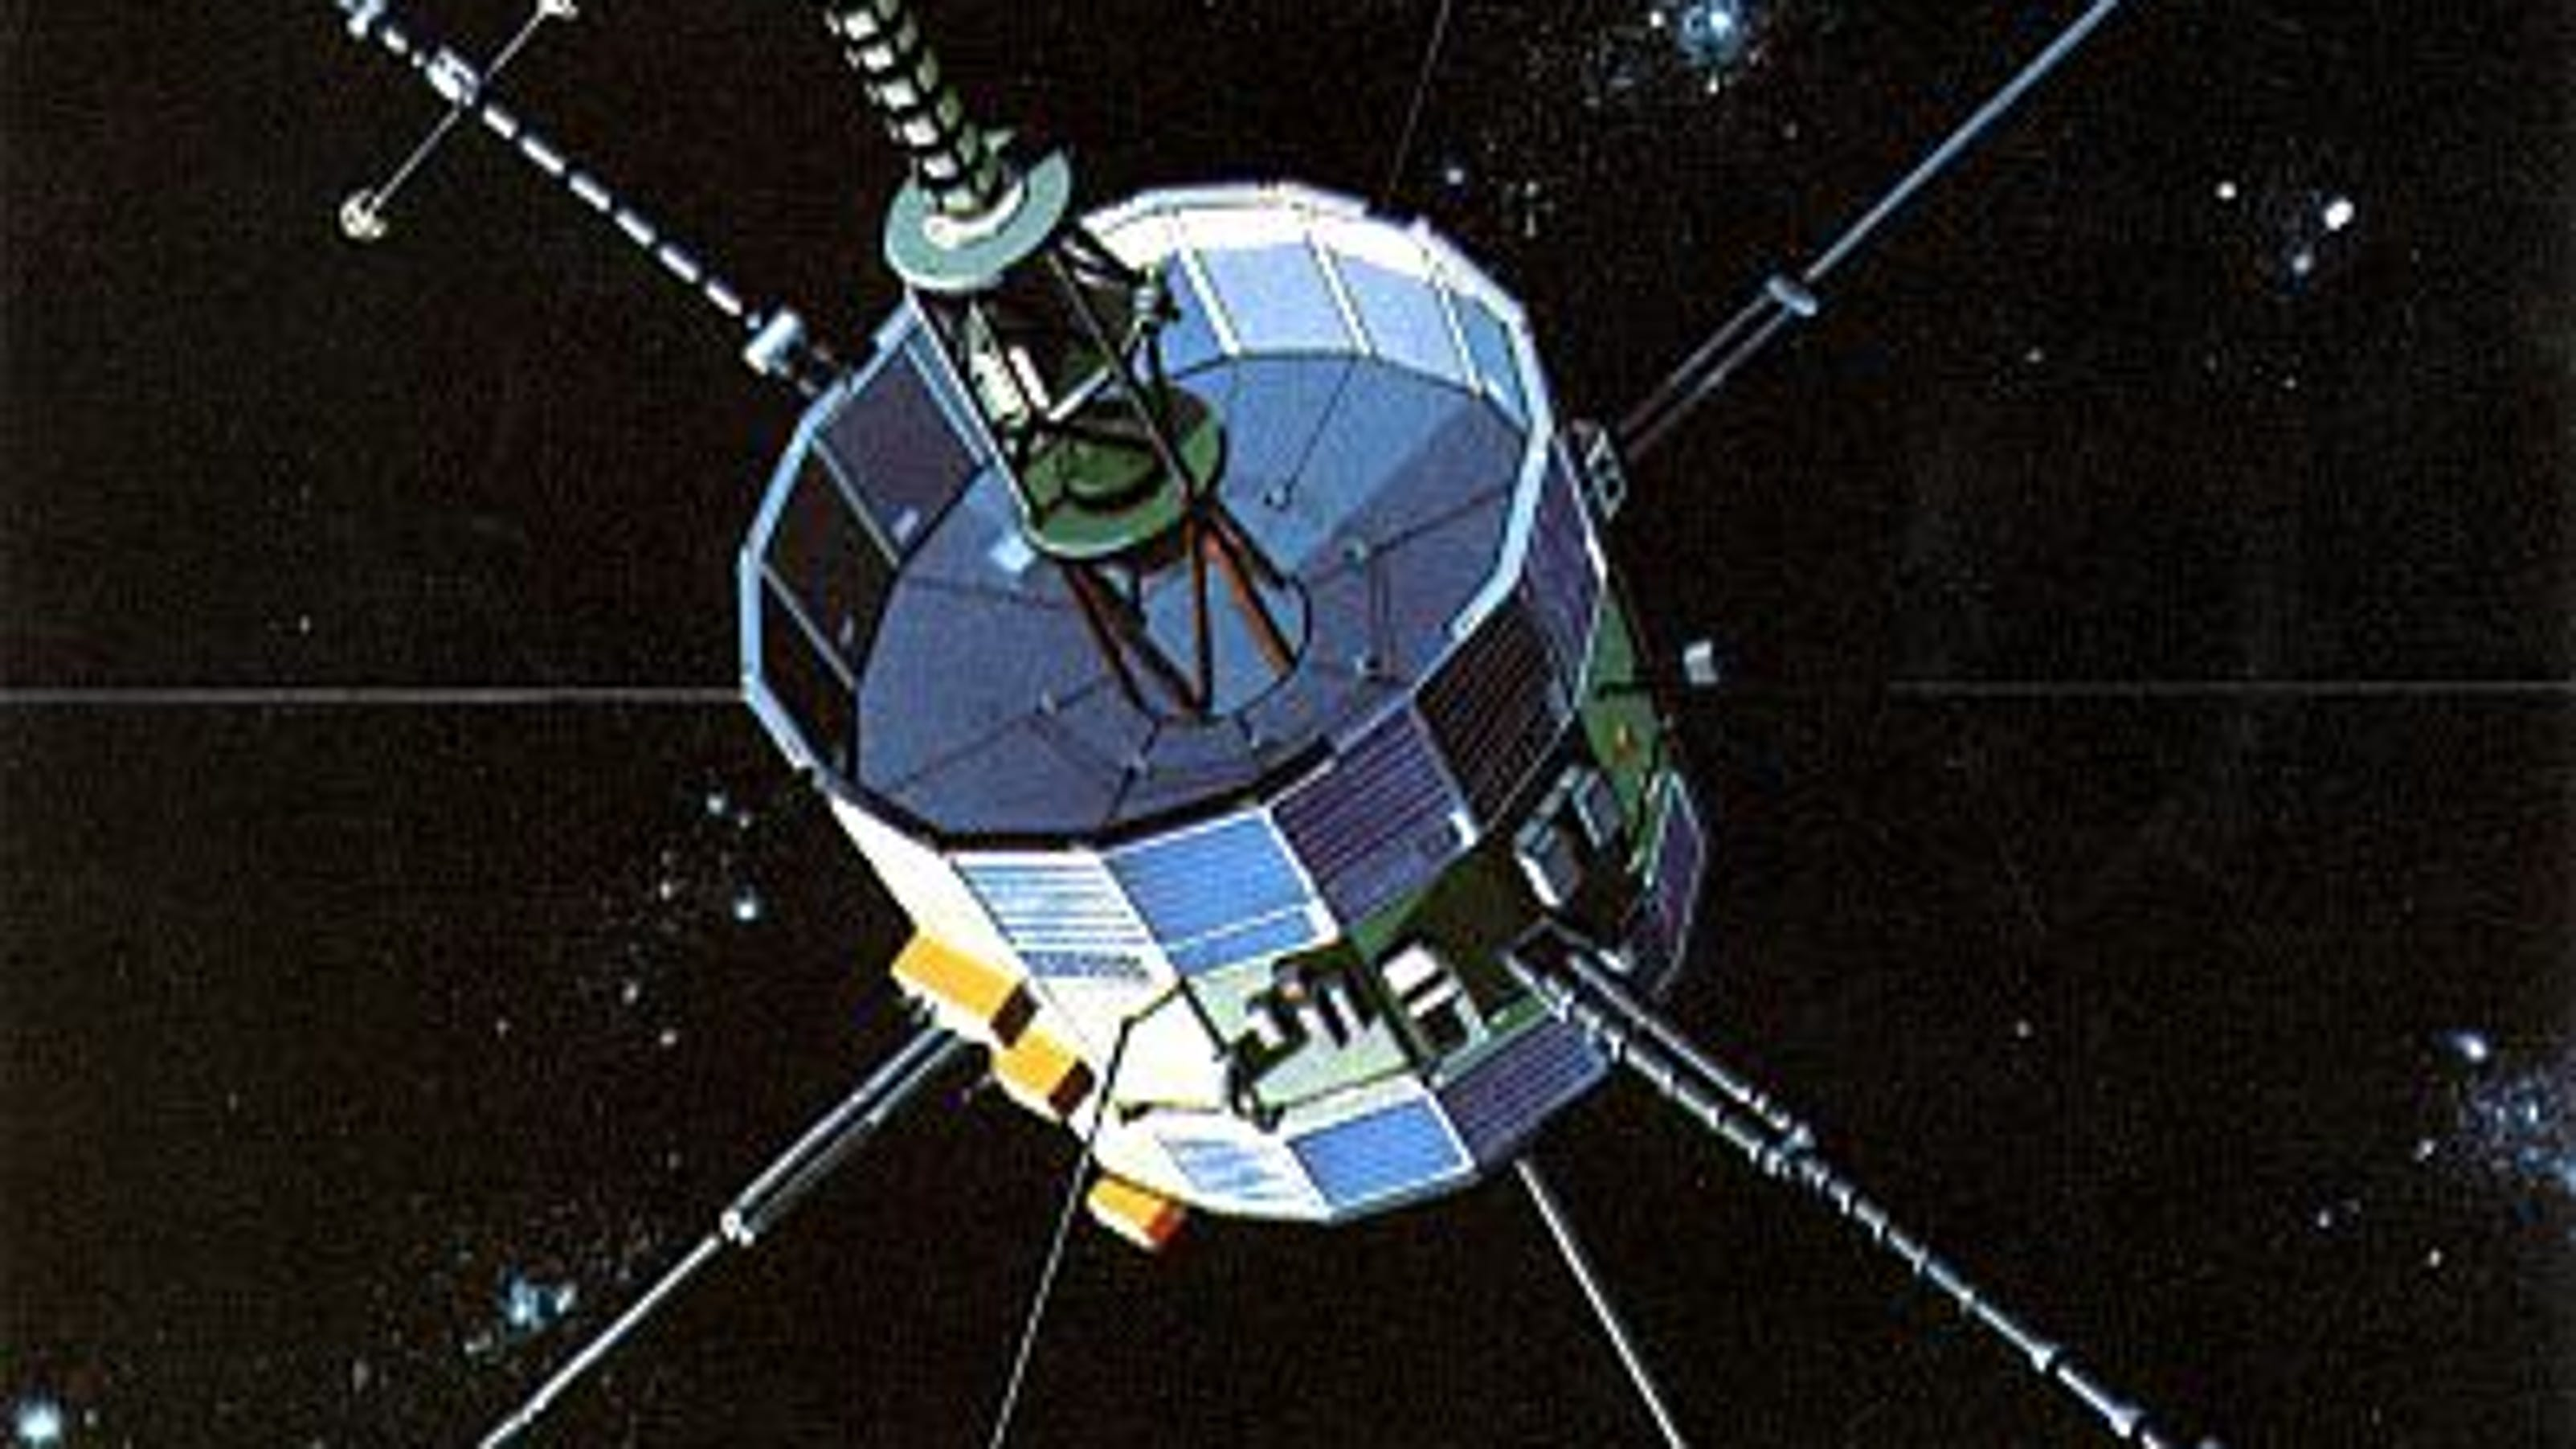 Citizen scientists aim to restart long-silent NASA probe